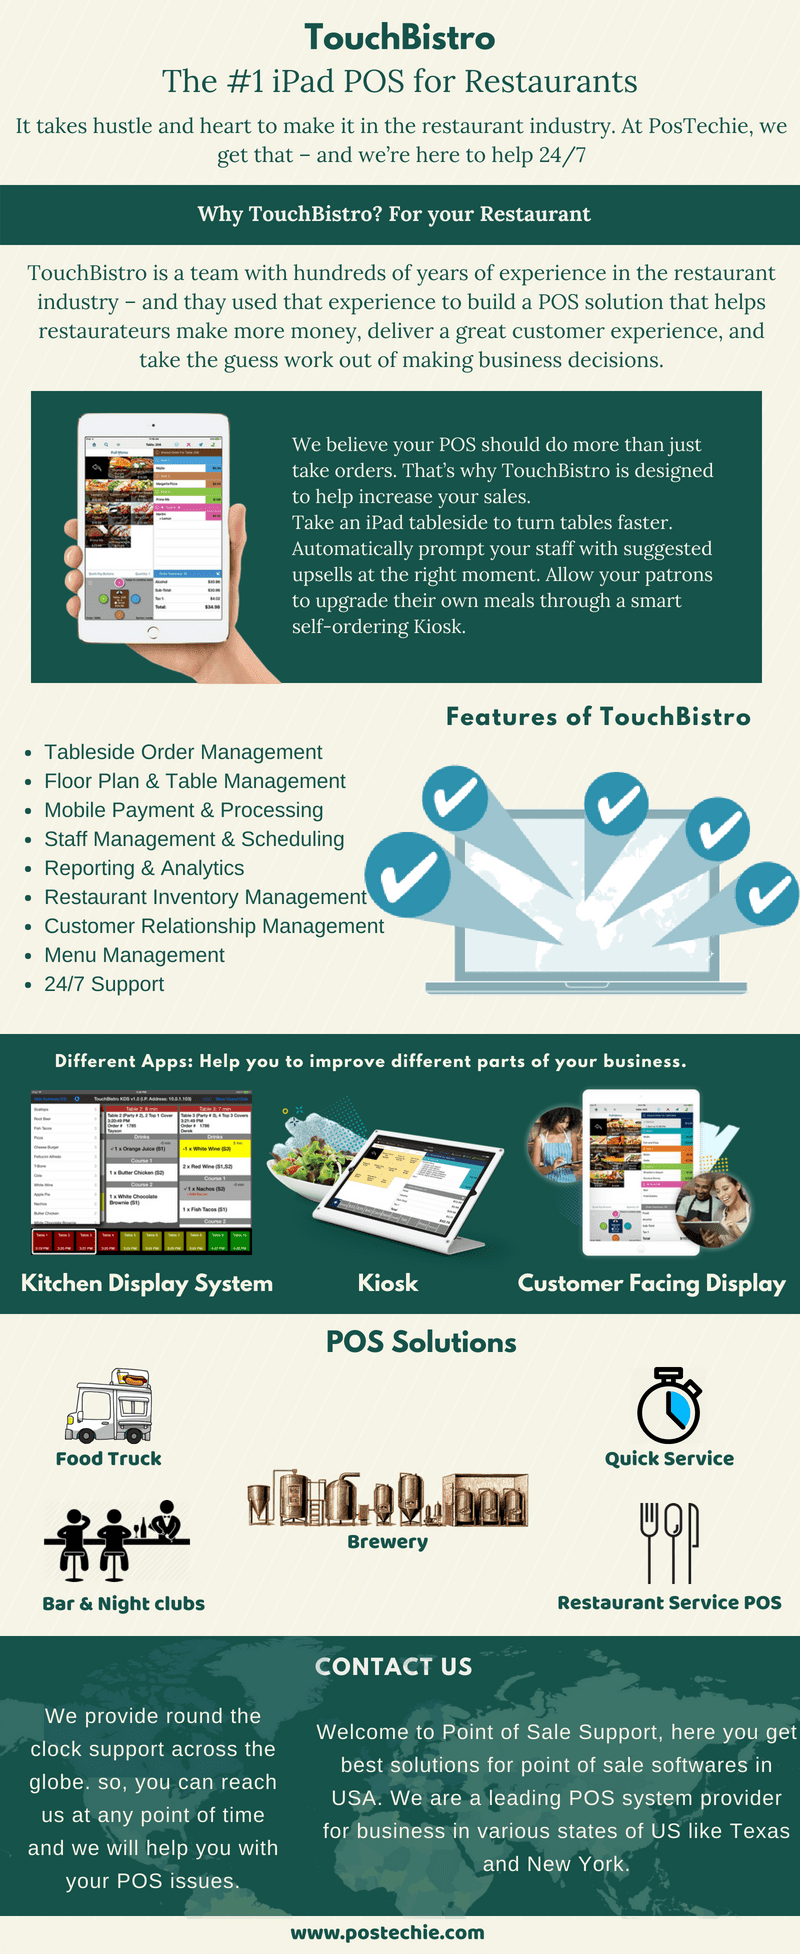 TouchBistro POS Support